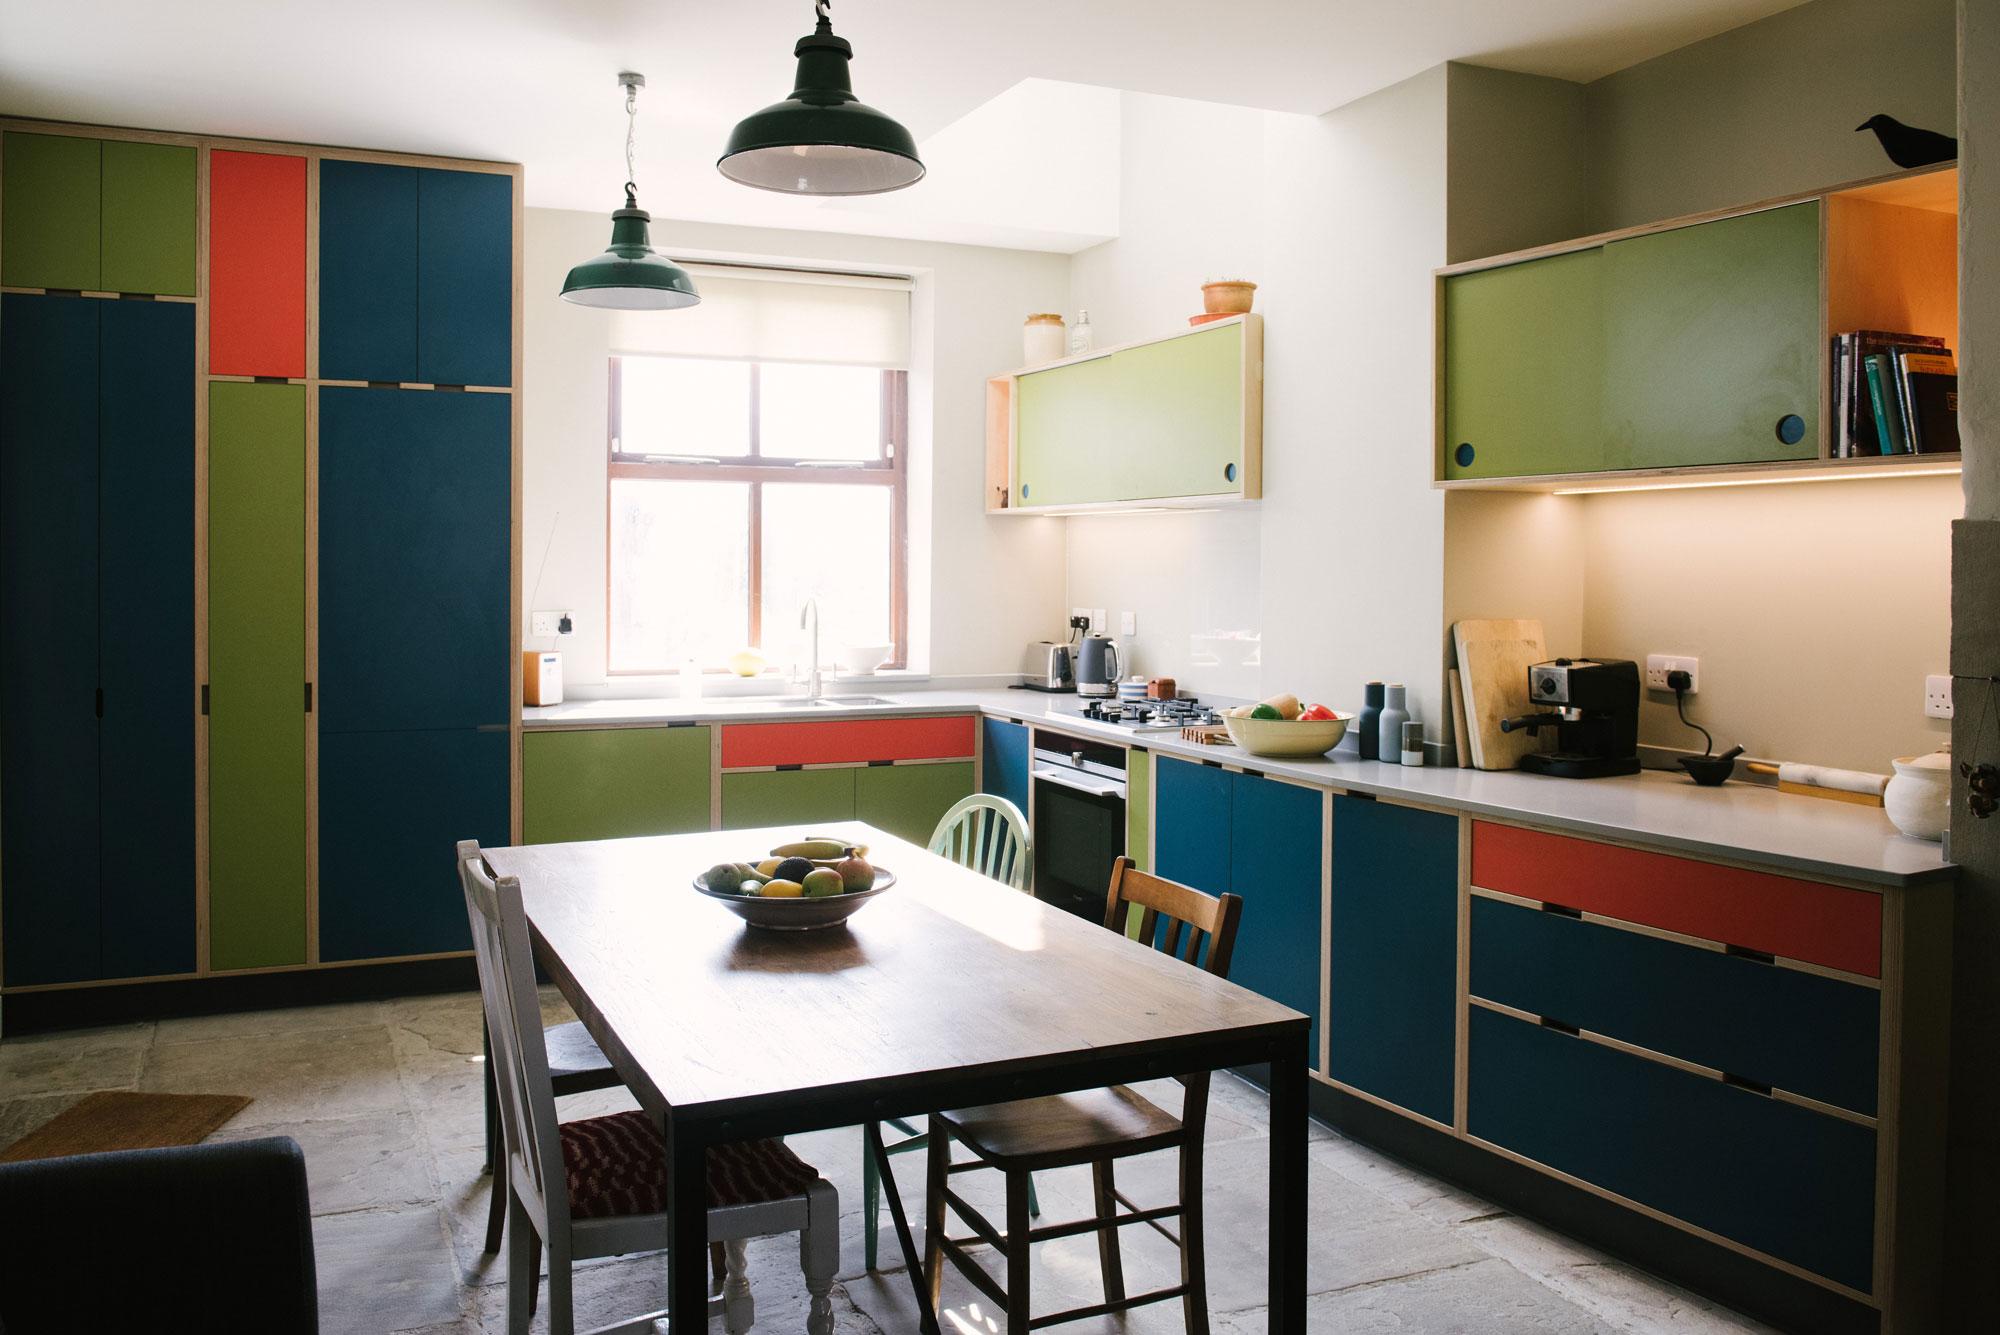 Green Orange & Blue Laminated Plywood Kitchen